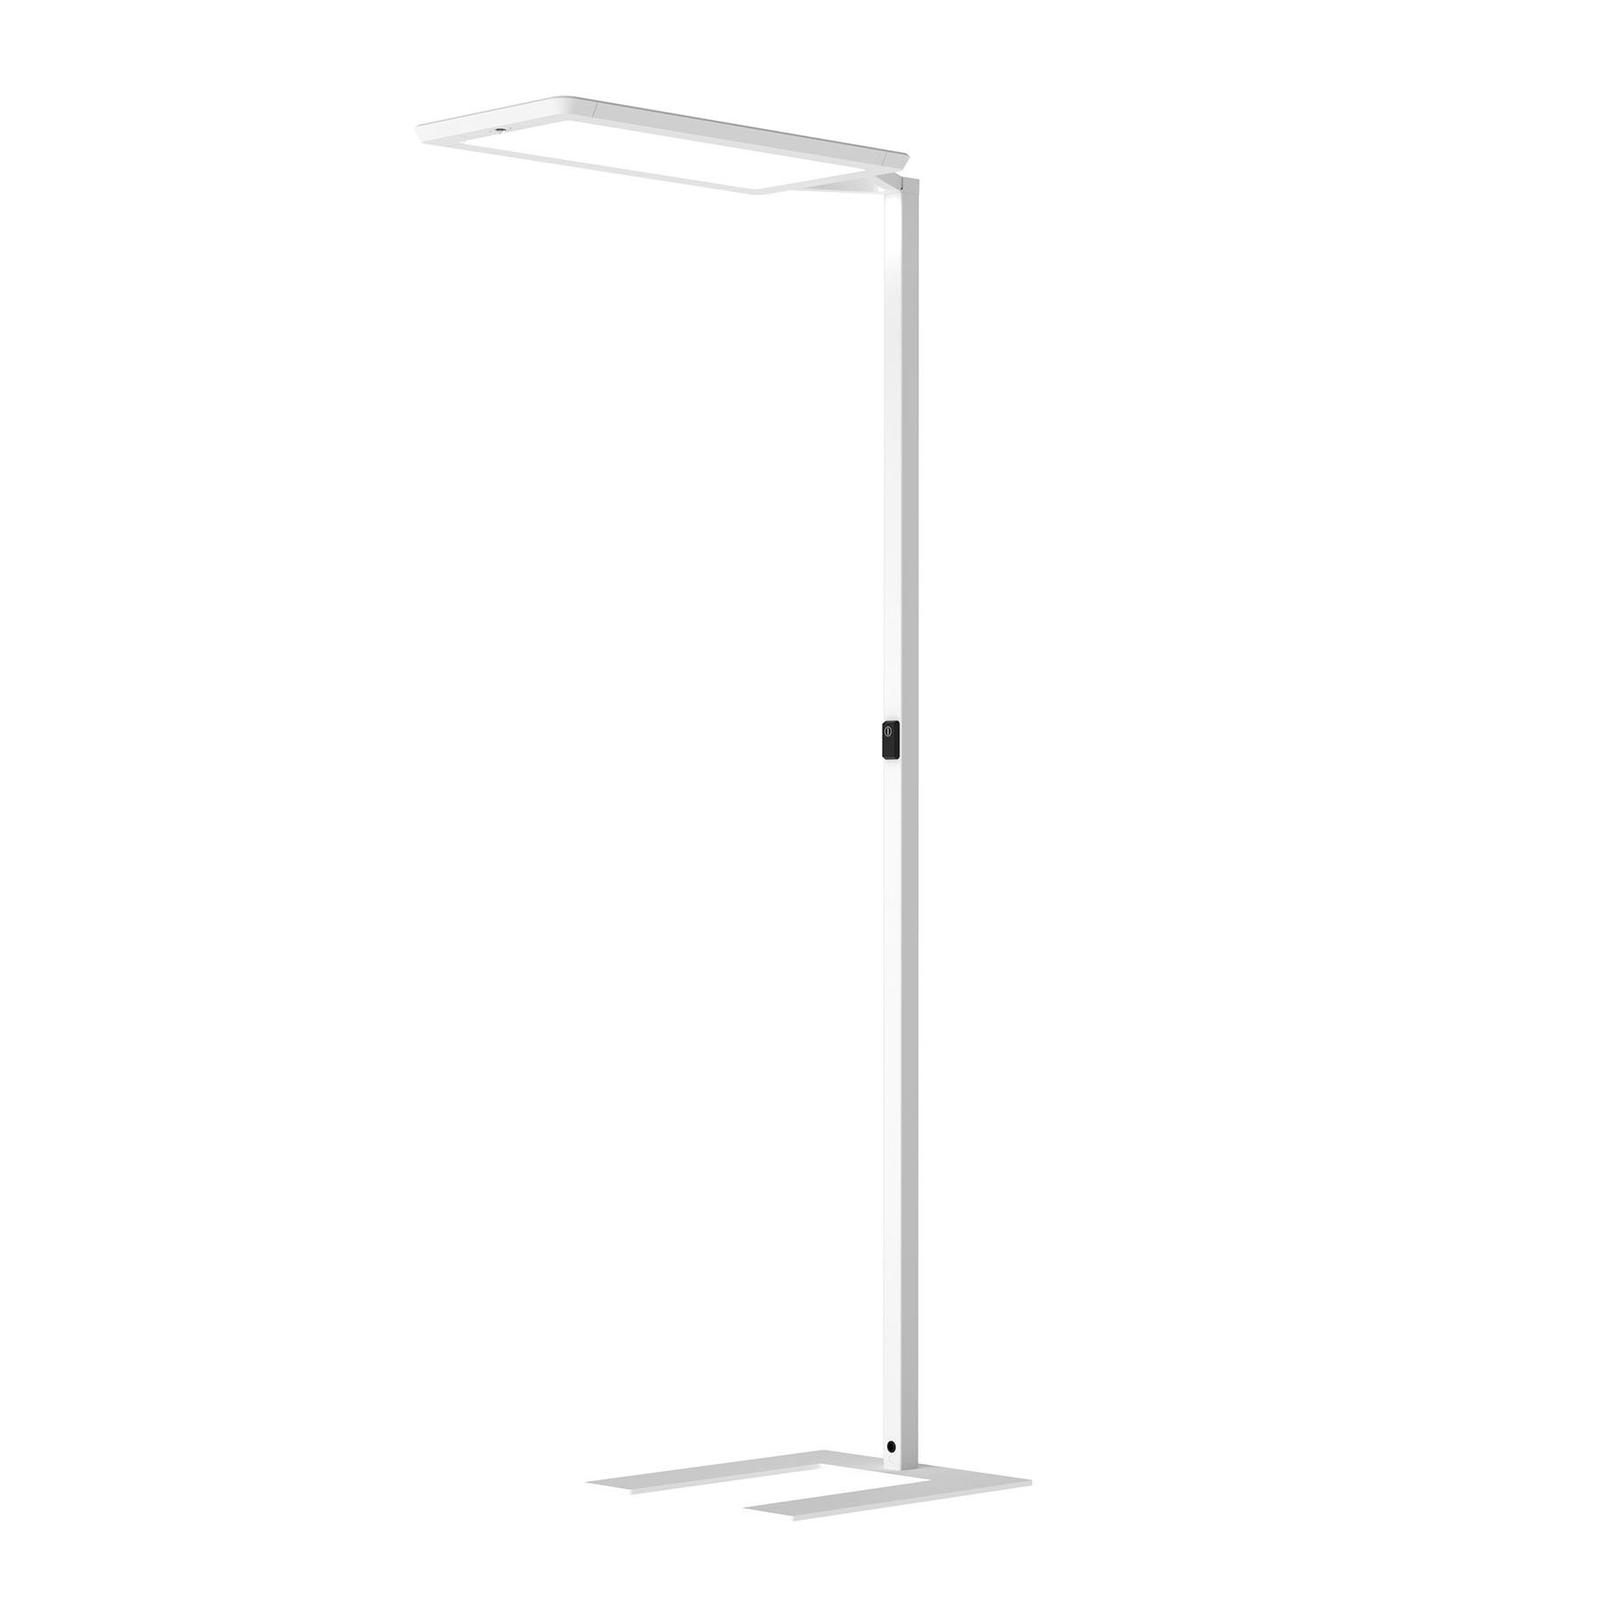 Lampa stojąca Yara.single 4000K, BT, PIR biała